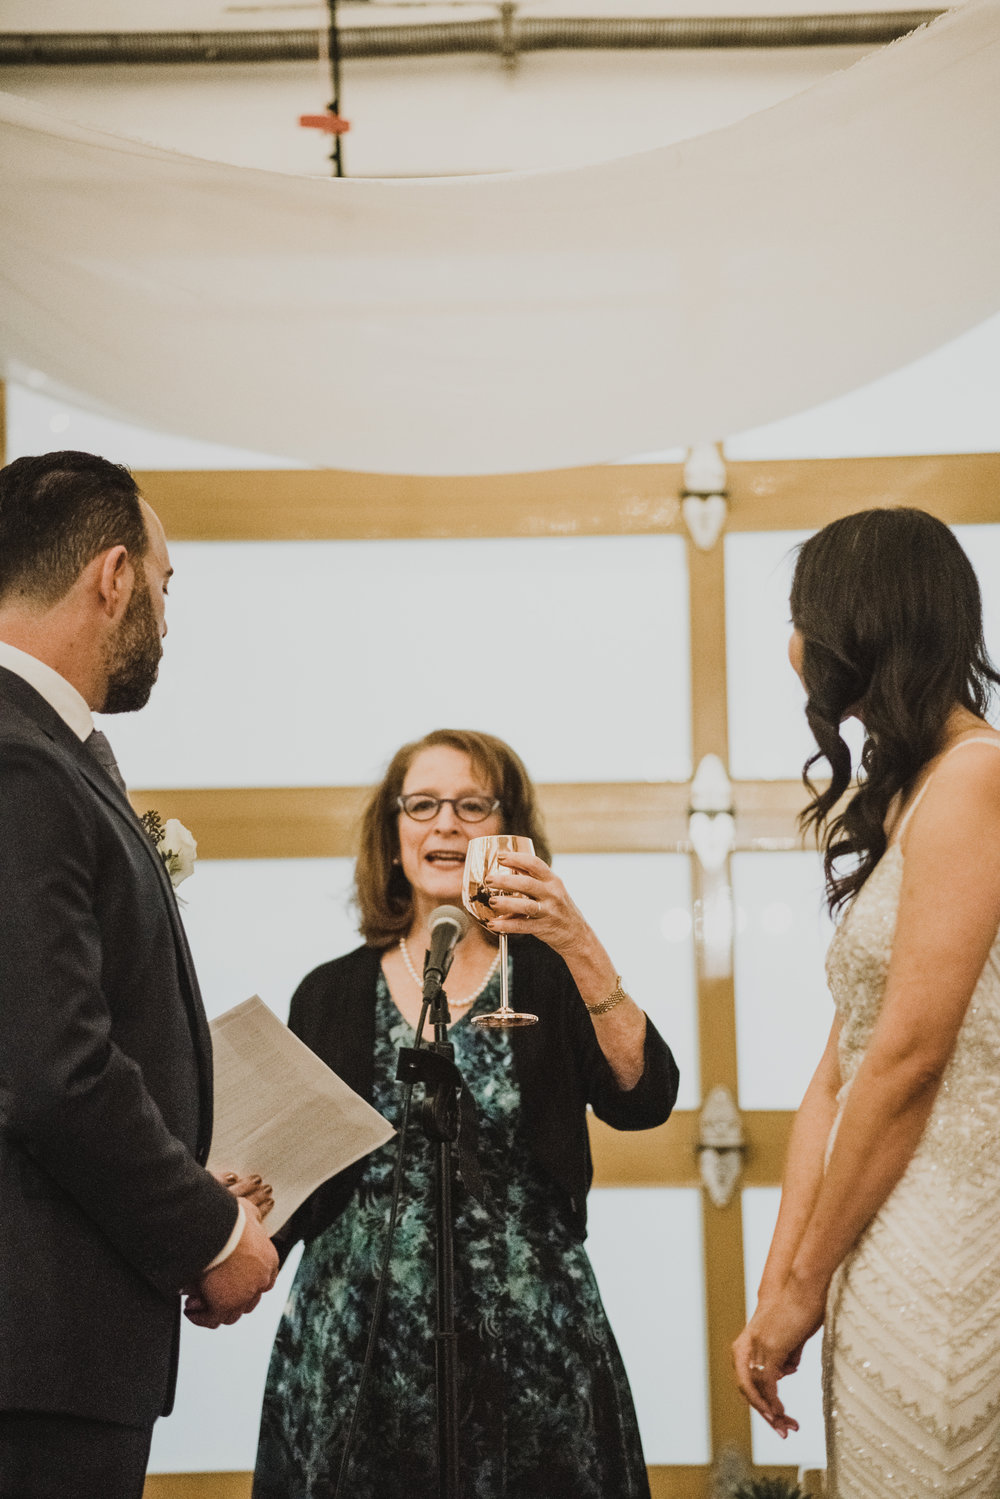 ©Isaiah + Taylor Photography - Big Door Studios Wedding, El Segundo, Los Angeles Wedding Photographer-74.jpg